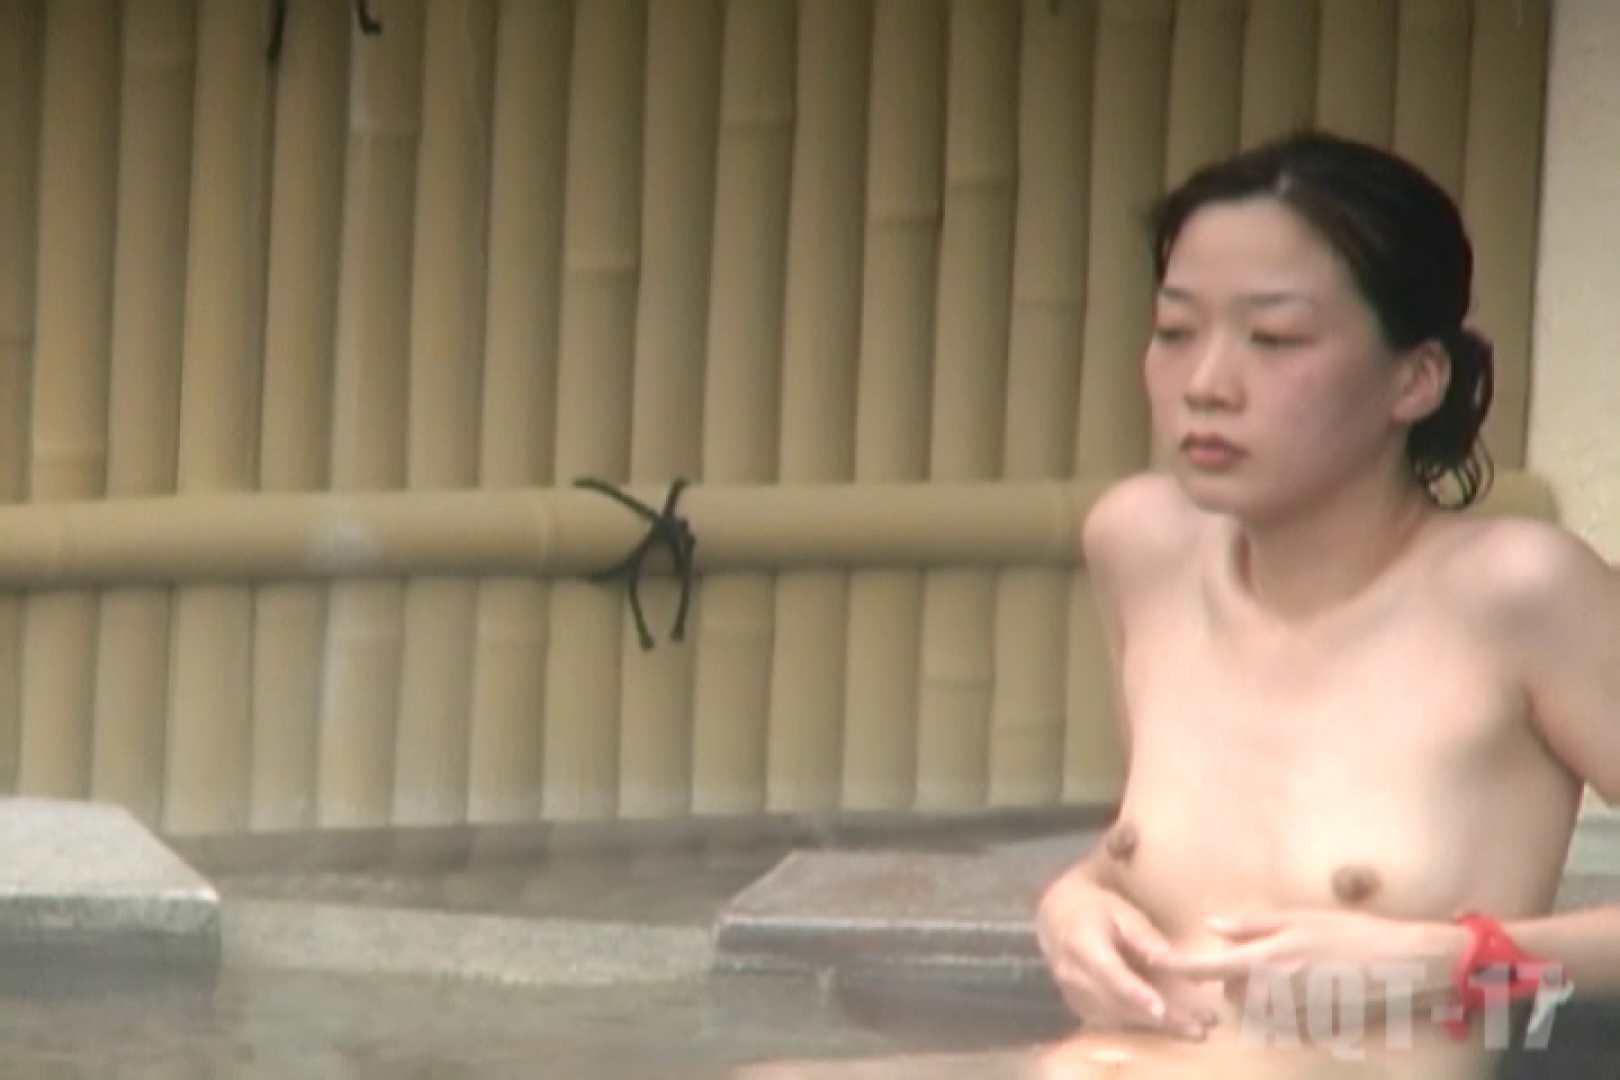 Aquaな露天風呂Vol.848 露天 オメコ無修正動画無料 12pic 2